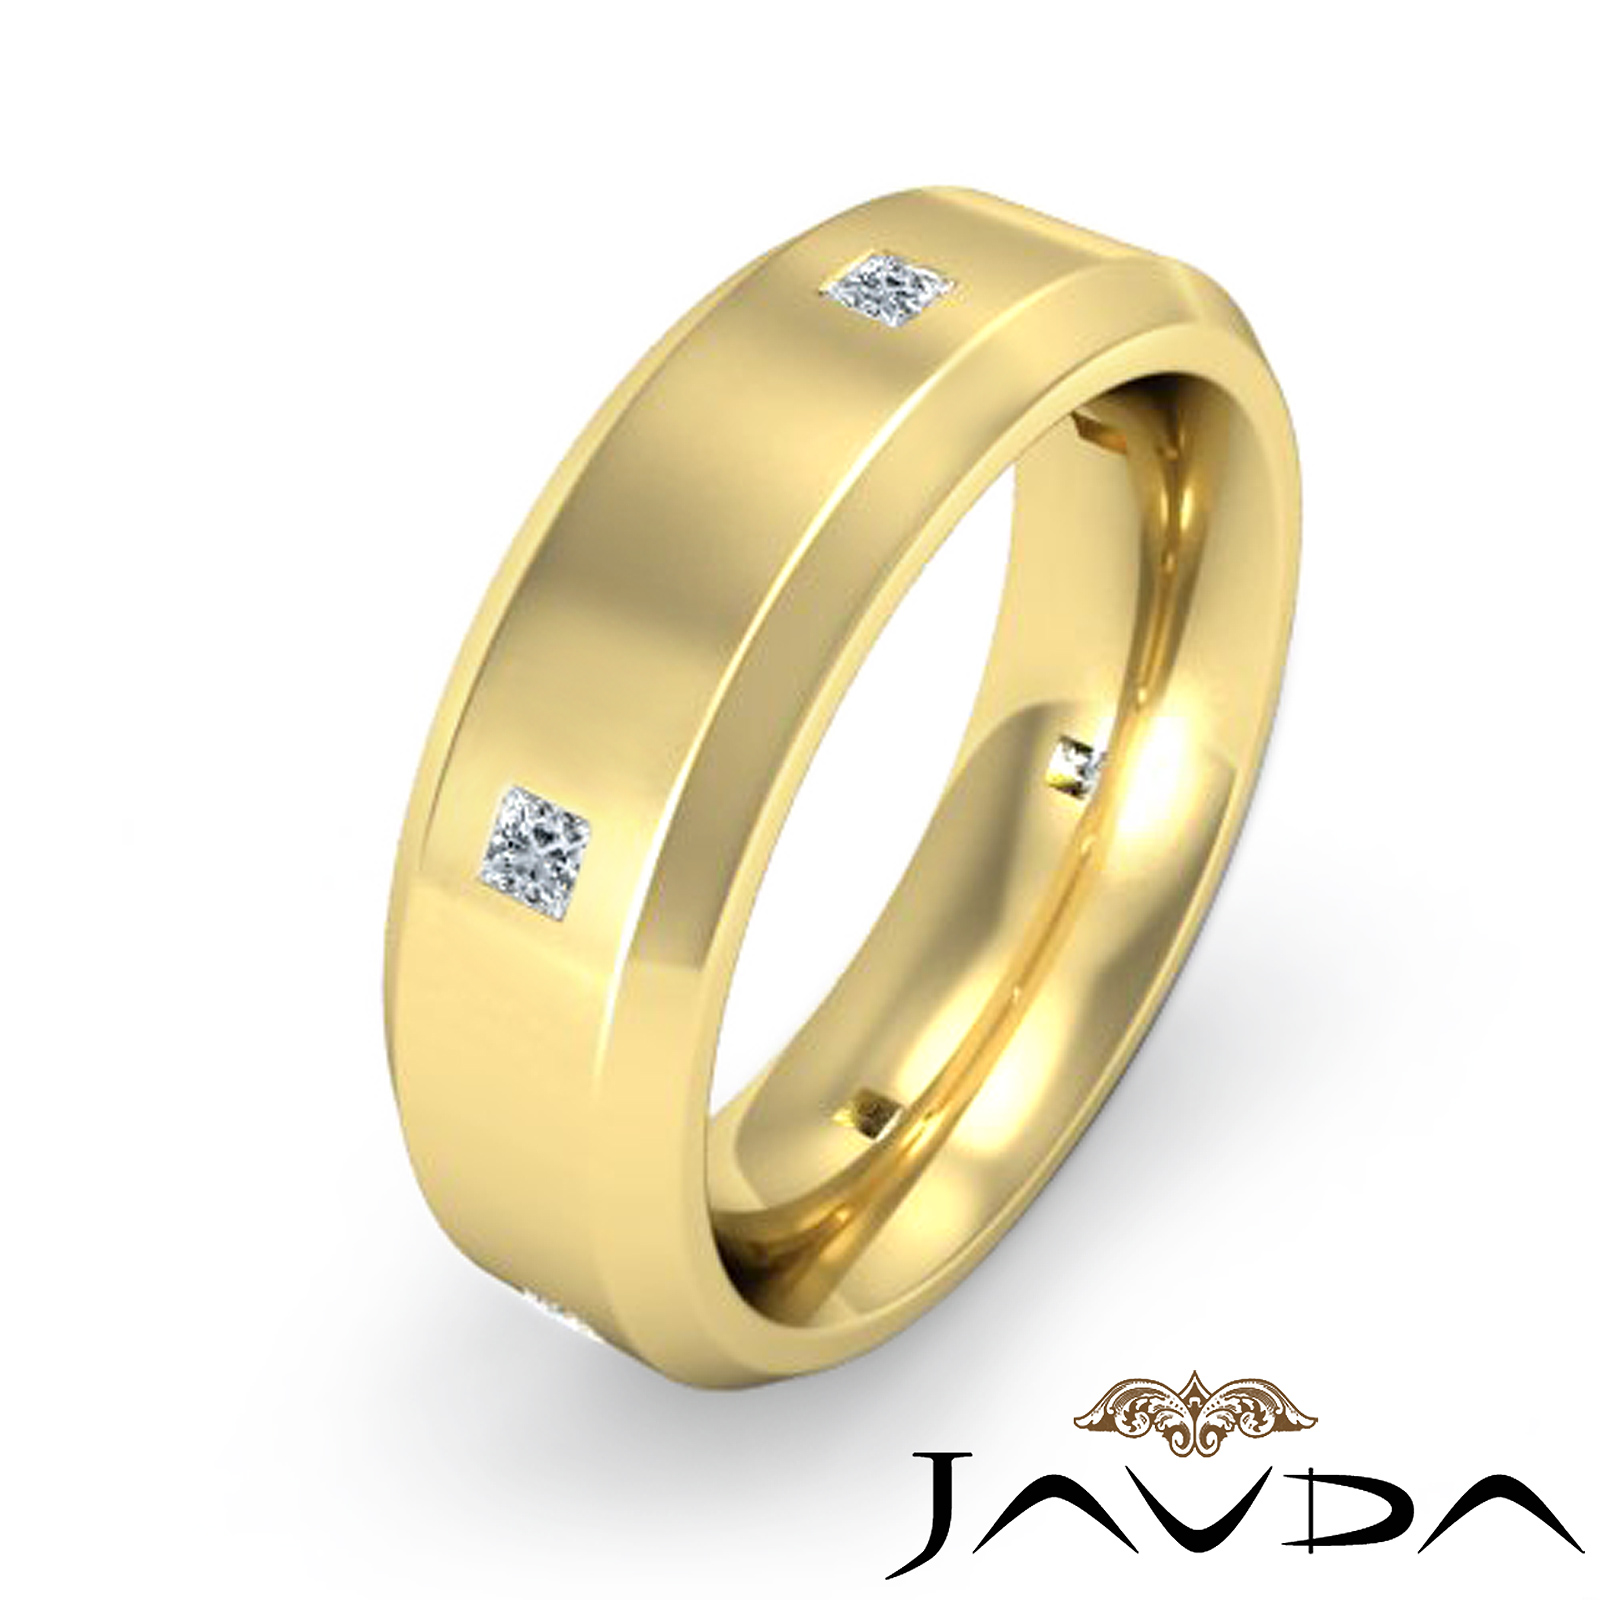 Mens wedding band princess diamond eternity ring 14k for Mens eternity wedding band